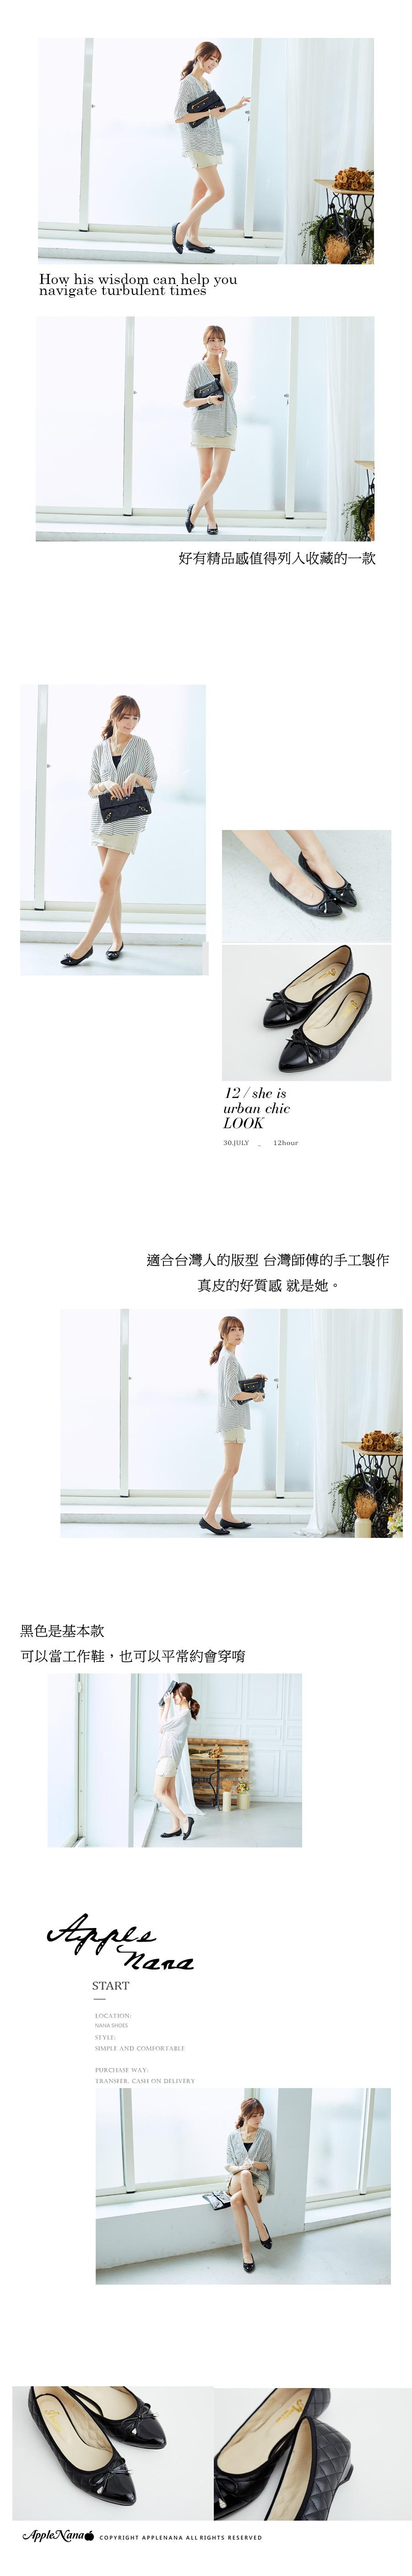 http://shop.r10s.com/5e7ca0c0-ec8c-11e4-ac44-005056b756e3/2016-06/101521-5.jpg